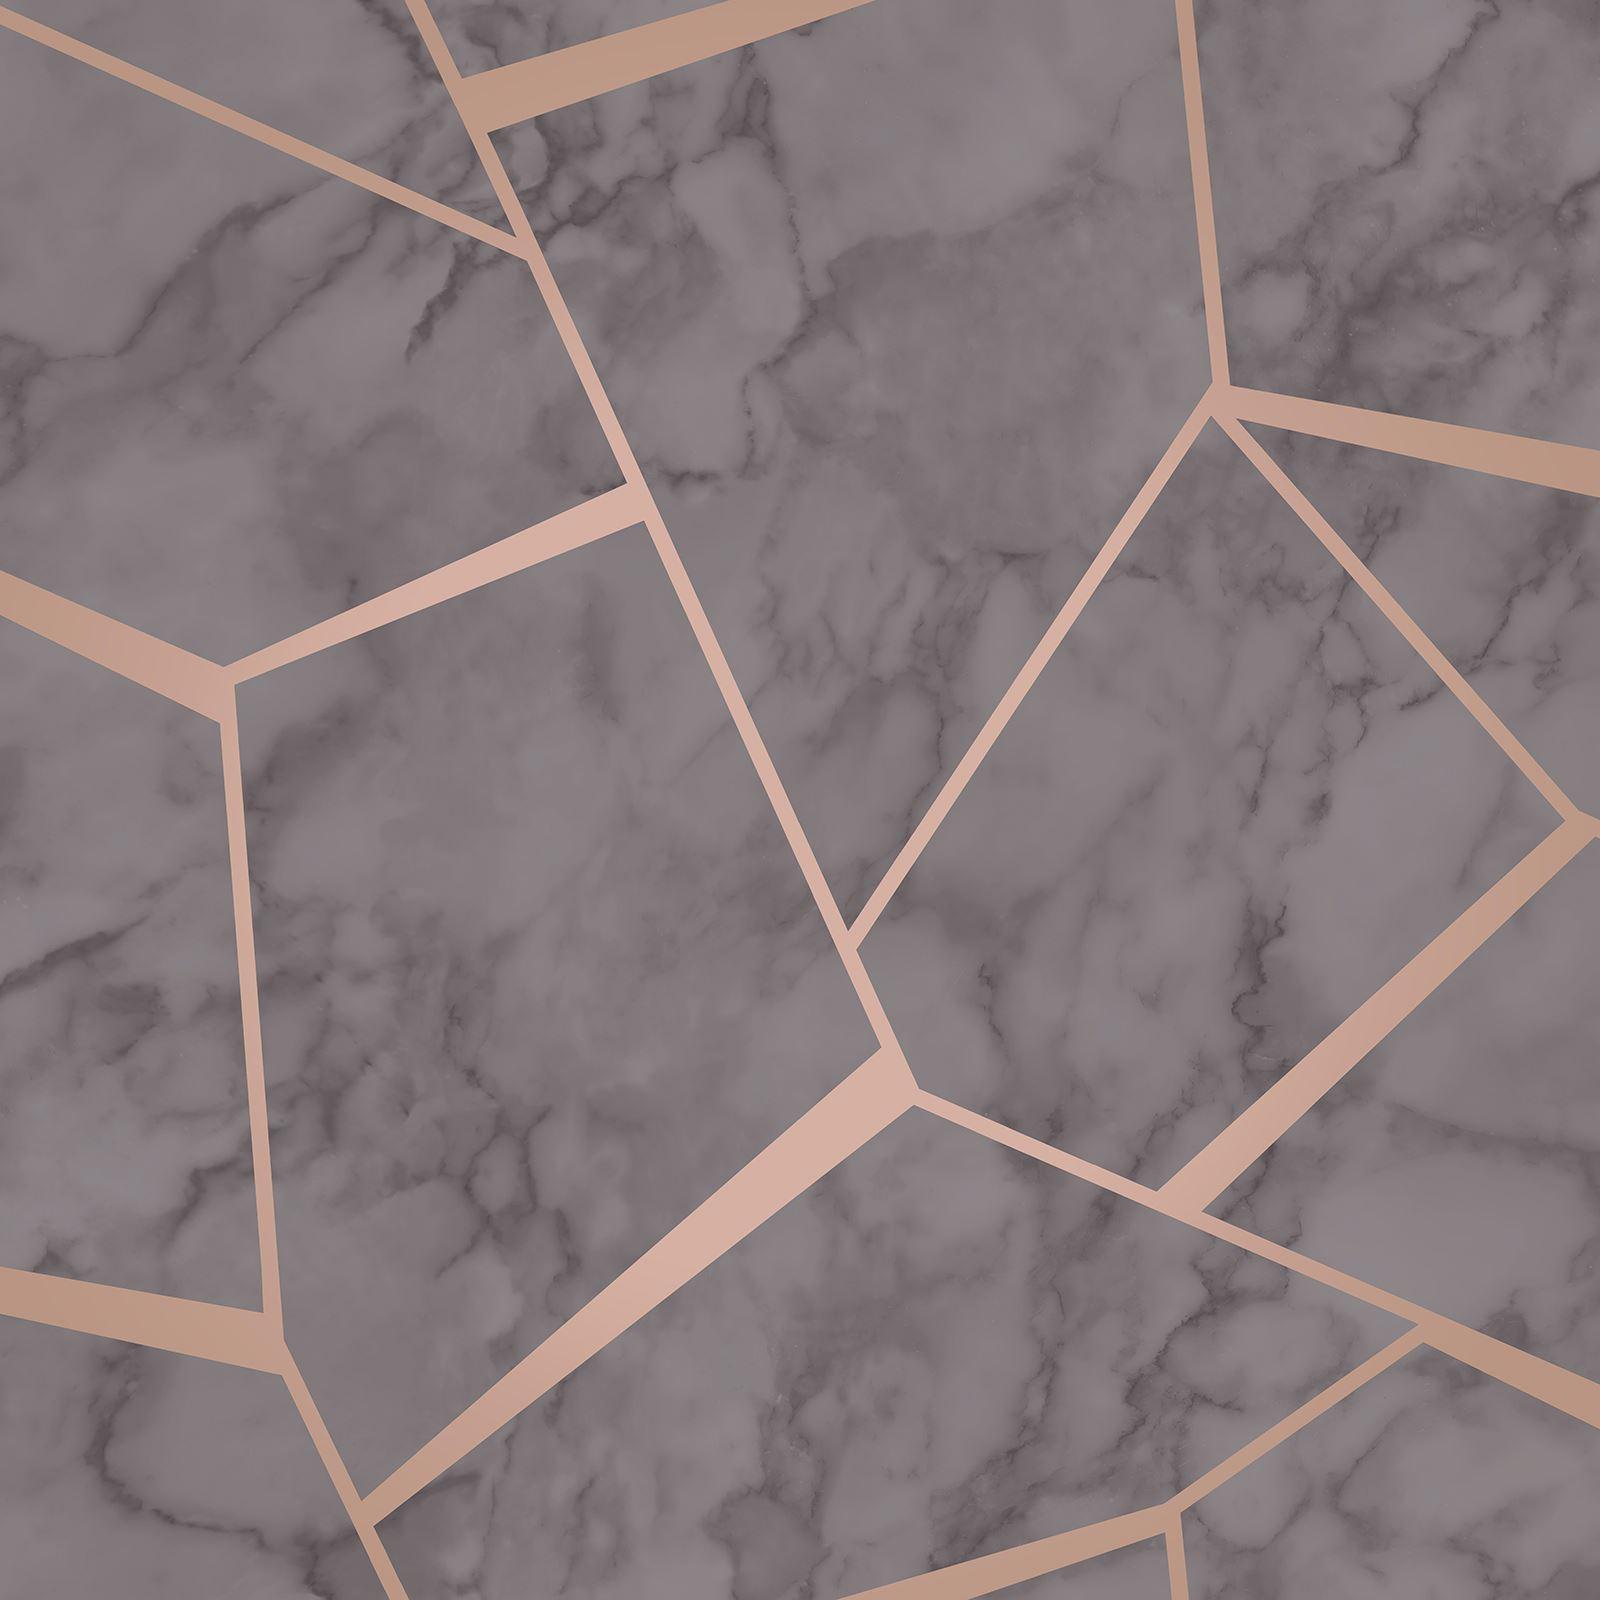 FINE DECOR METALLIC GEOMETRIC PLAIN MARBLE WALLPAPER ROSE